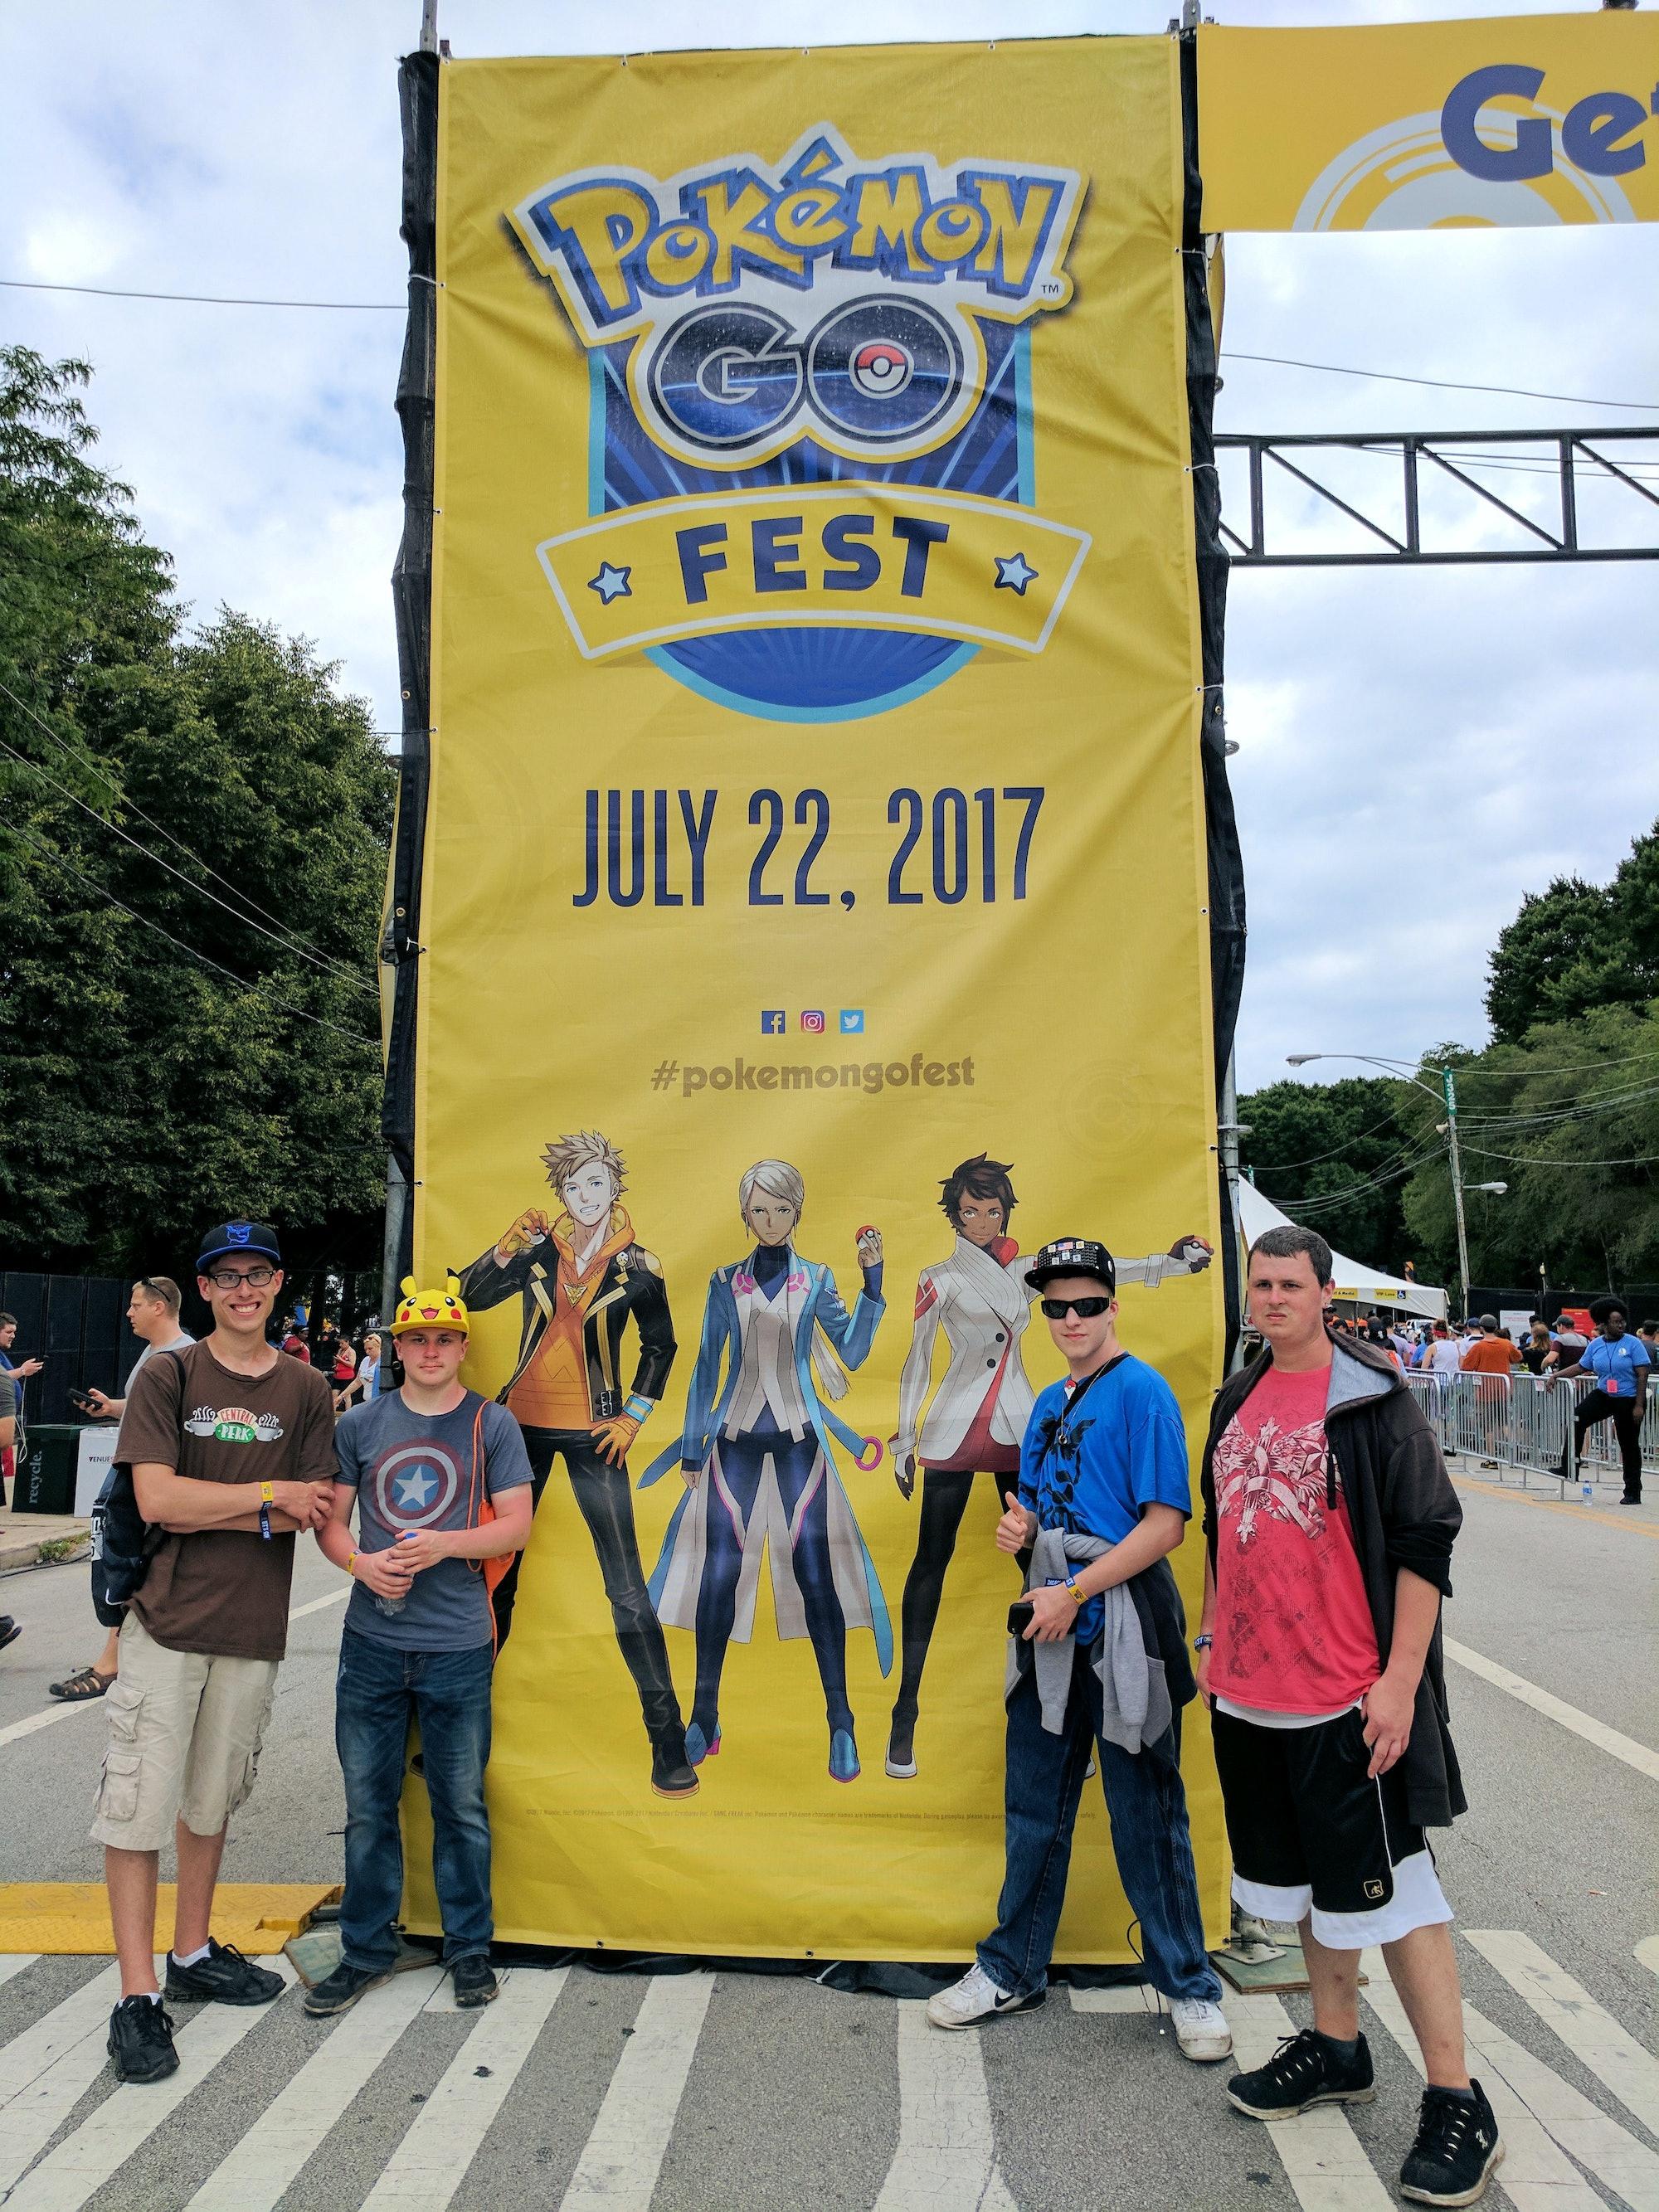 Pokemon Go Fest - 07-22-2017 - Photo 18